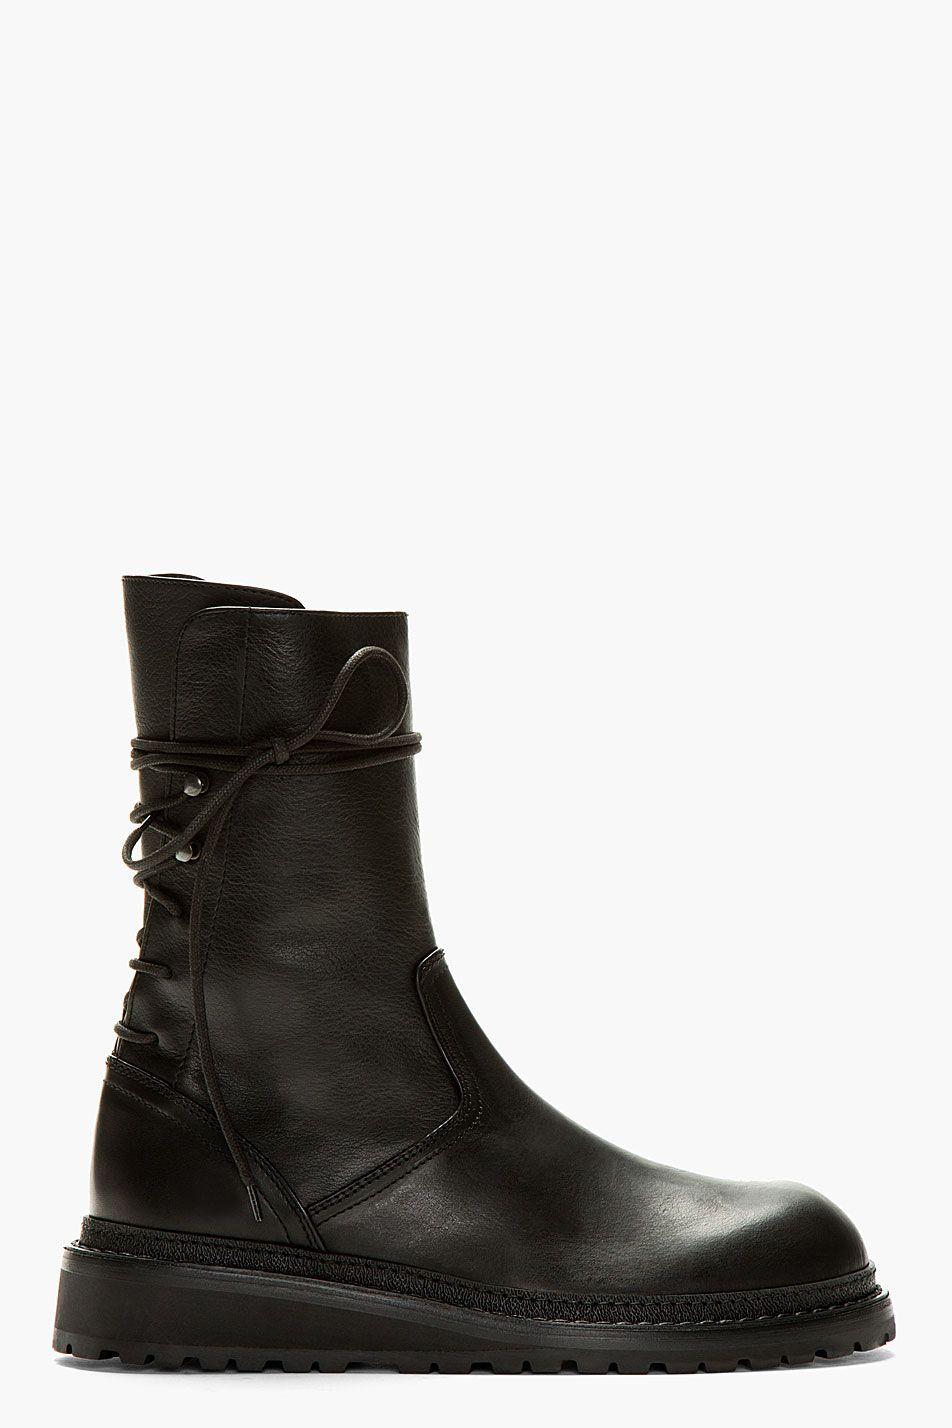 Black Tall Lace-Up Boots Ann Demeulemeester 06u4Ik9KdG